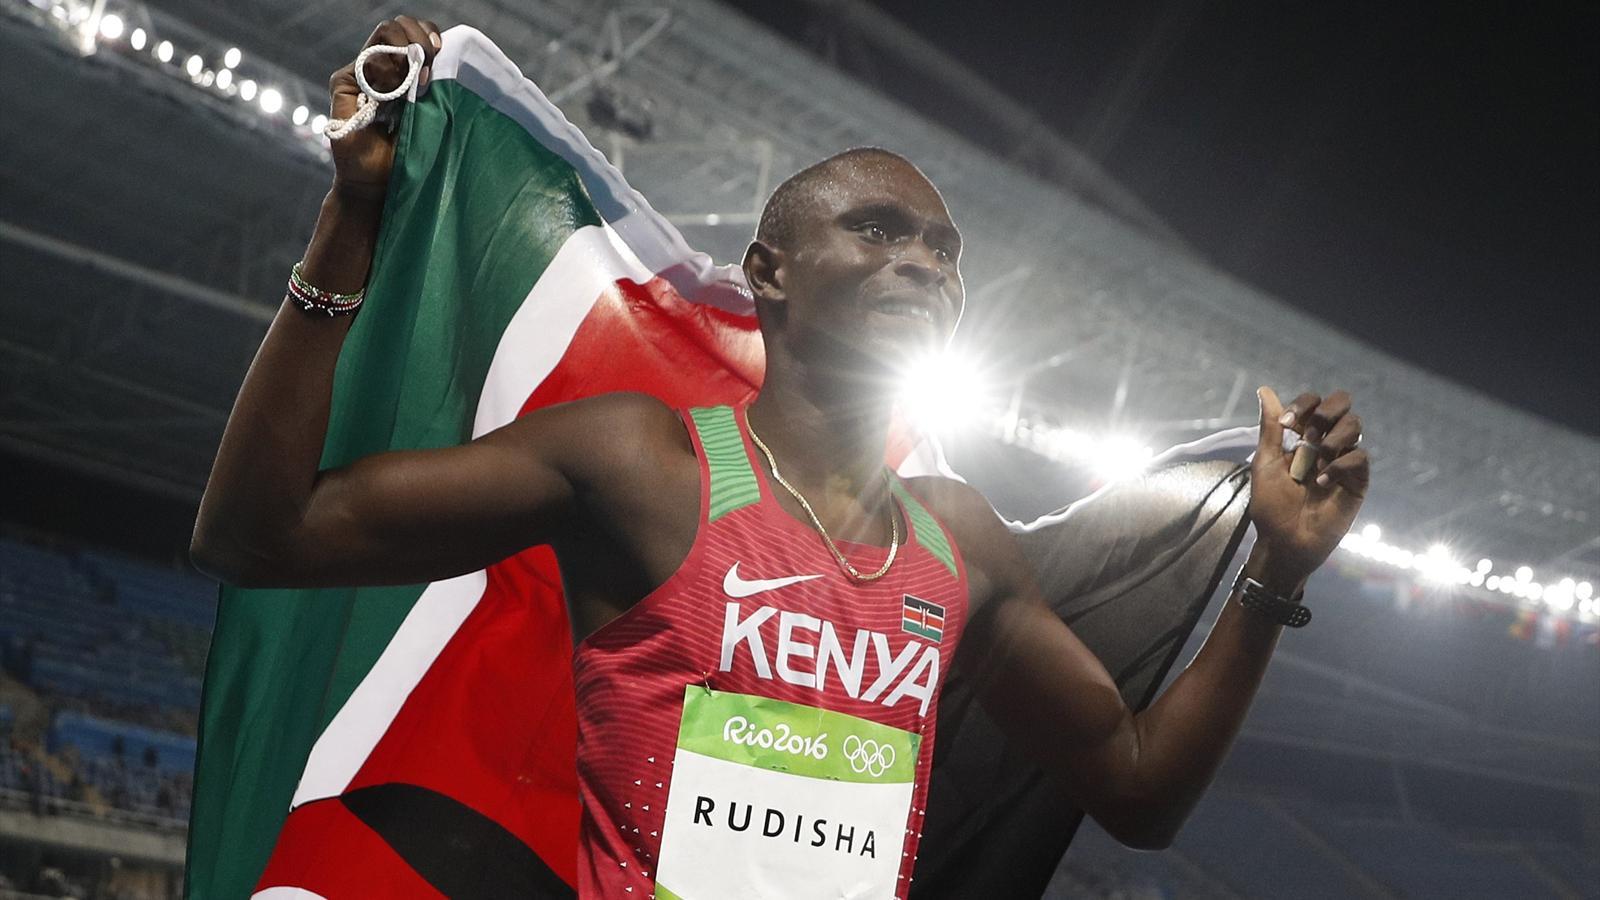 Kenya's Rudisha aims to regain fitness, defend Olympic title